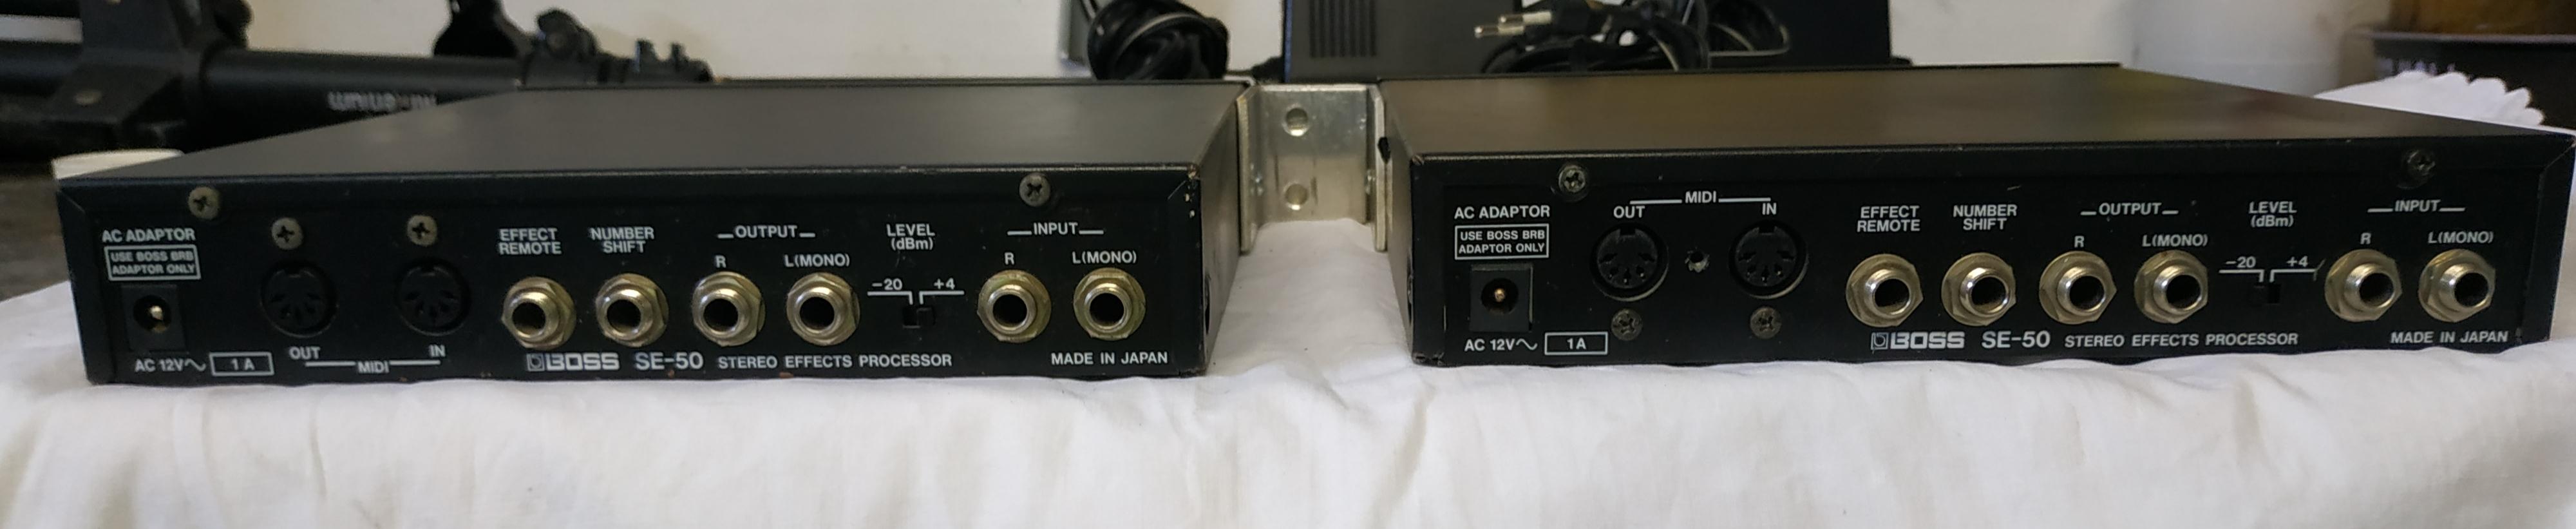 https://medias.audiofanzine.com/images/normal/boss-se-50-stereo-effects-processor-2980787.jpg